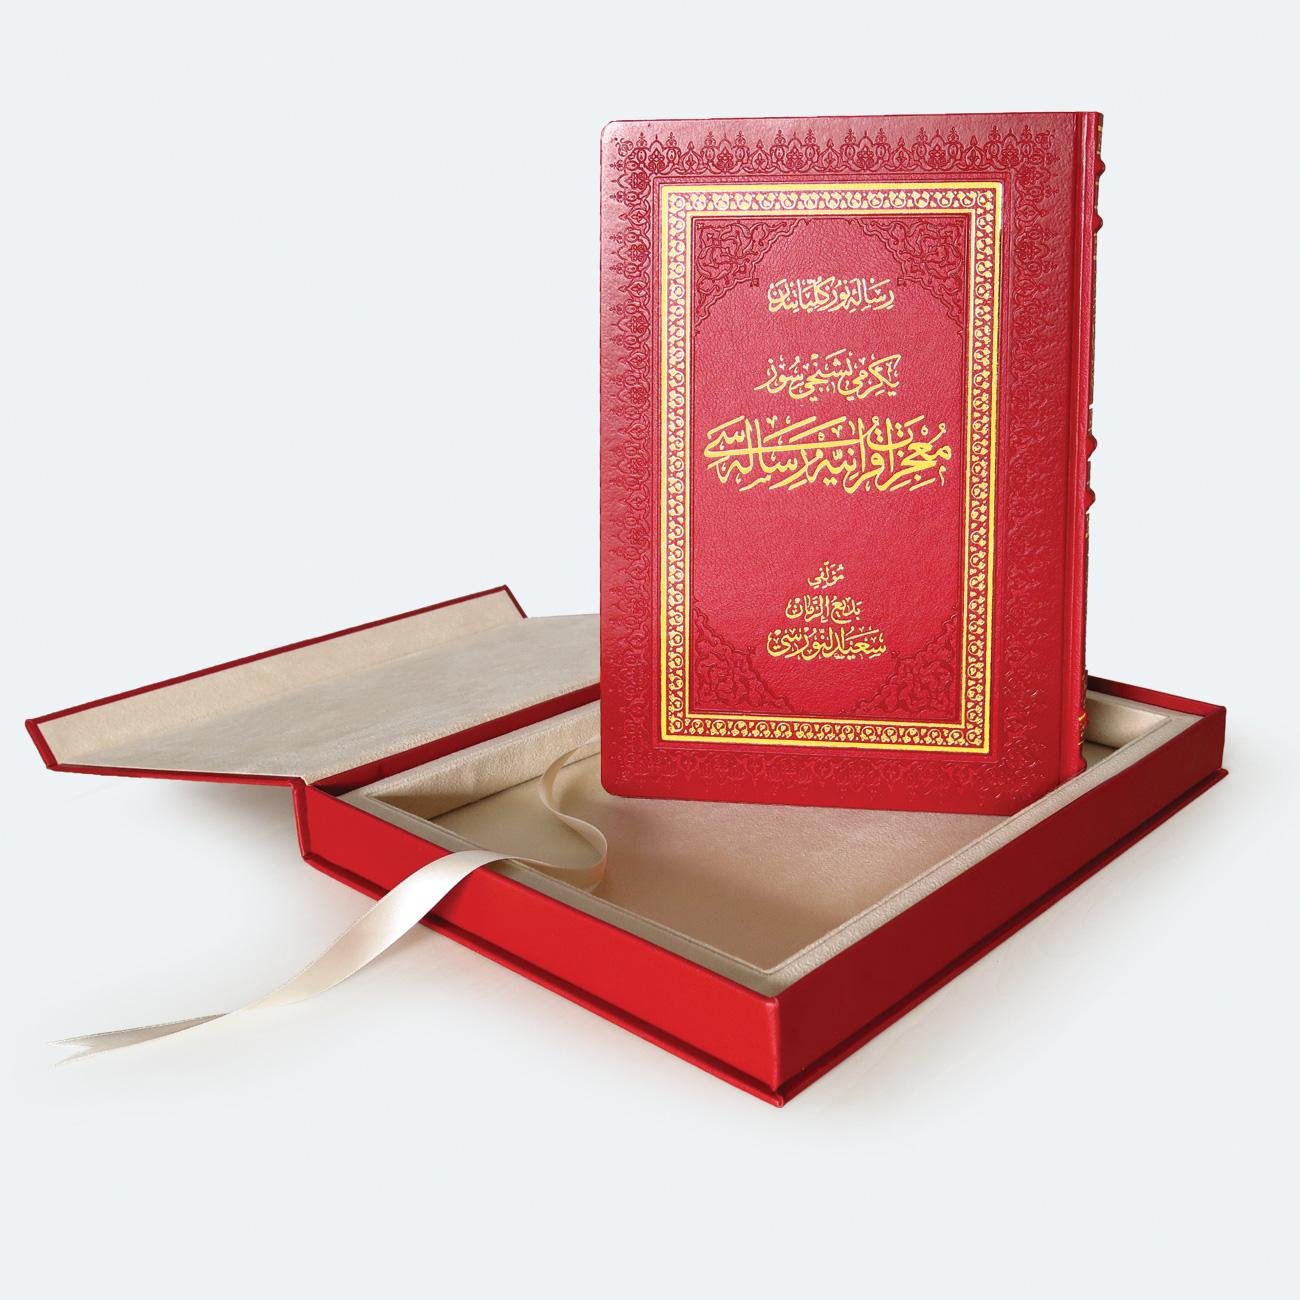 Yirmi Beşinci Söz Mu'cizat-ı Kur'aniye Kutulu (623)